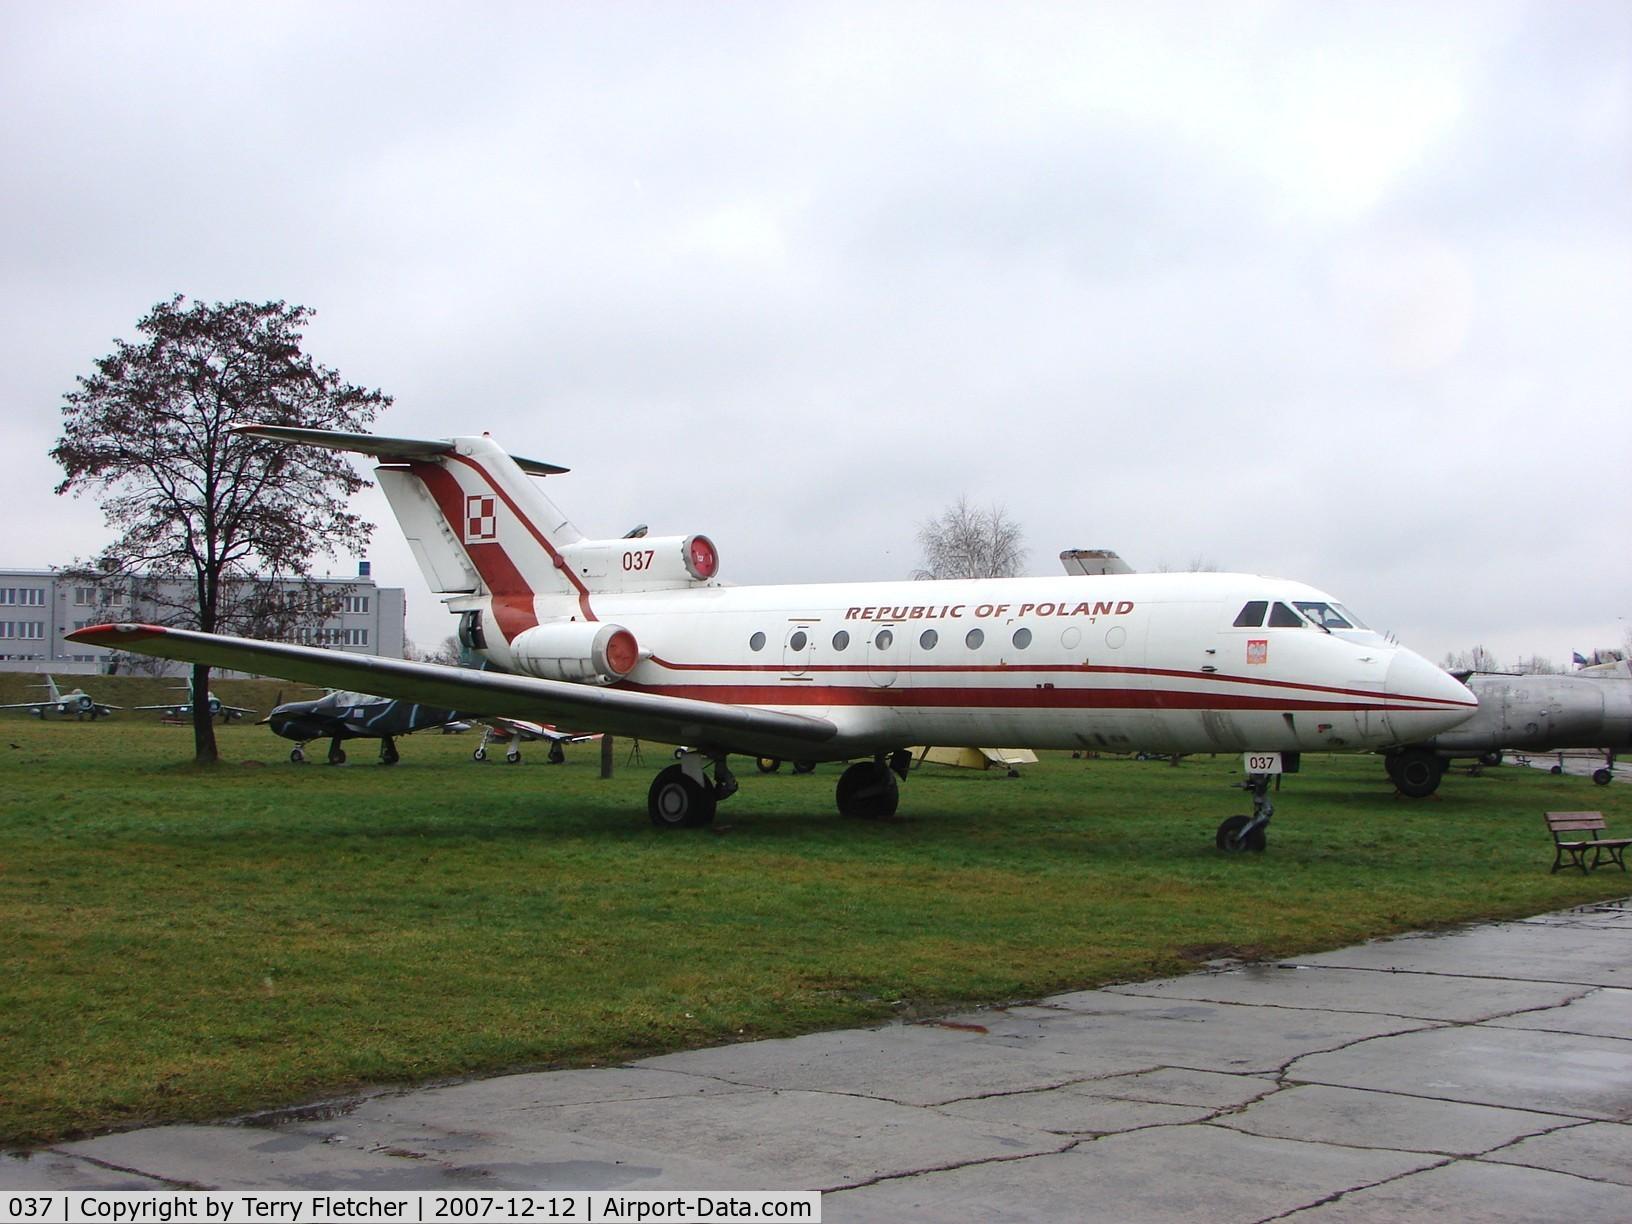 037, Yakovlev Yak-40 C/N 9510238, ex Polish AF Yakovlev 40 c/n 9510238 preserved at the Poland Aviation Museum in Krakow